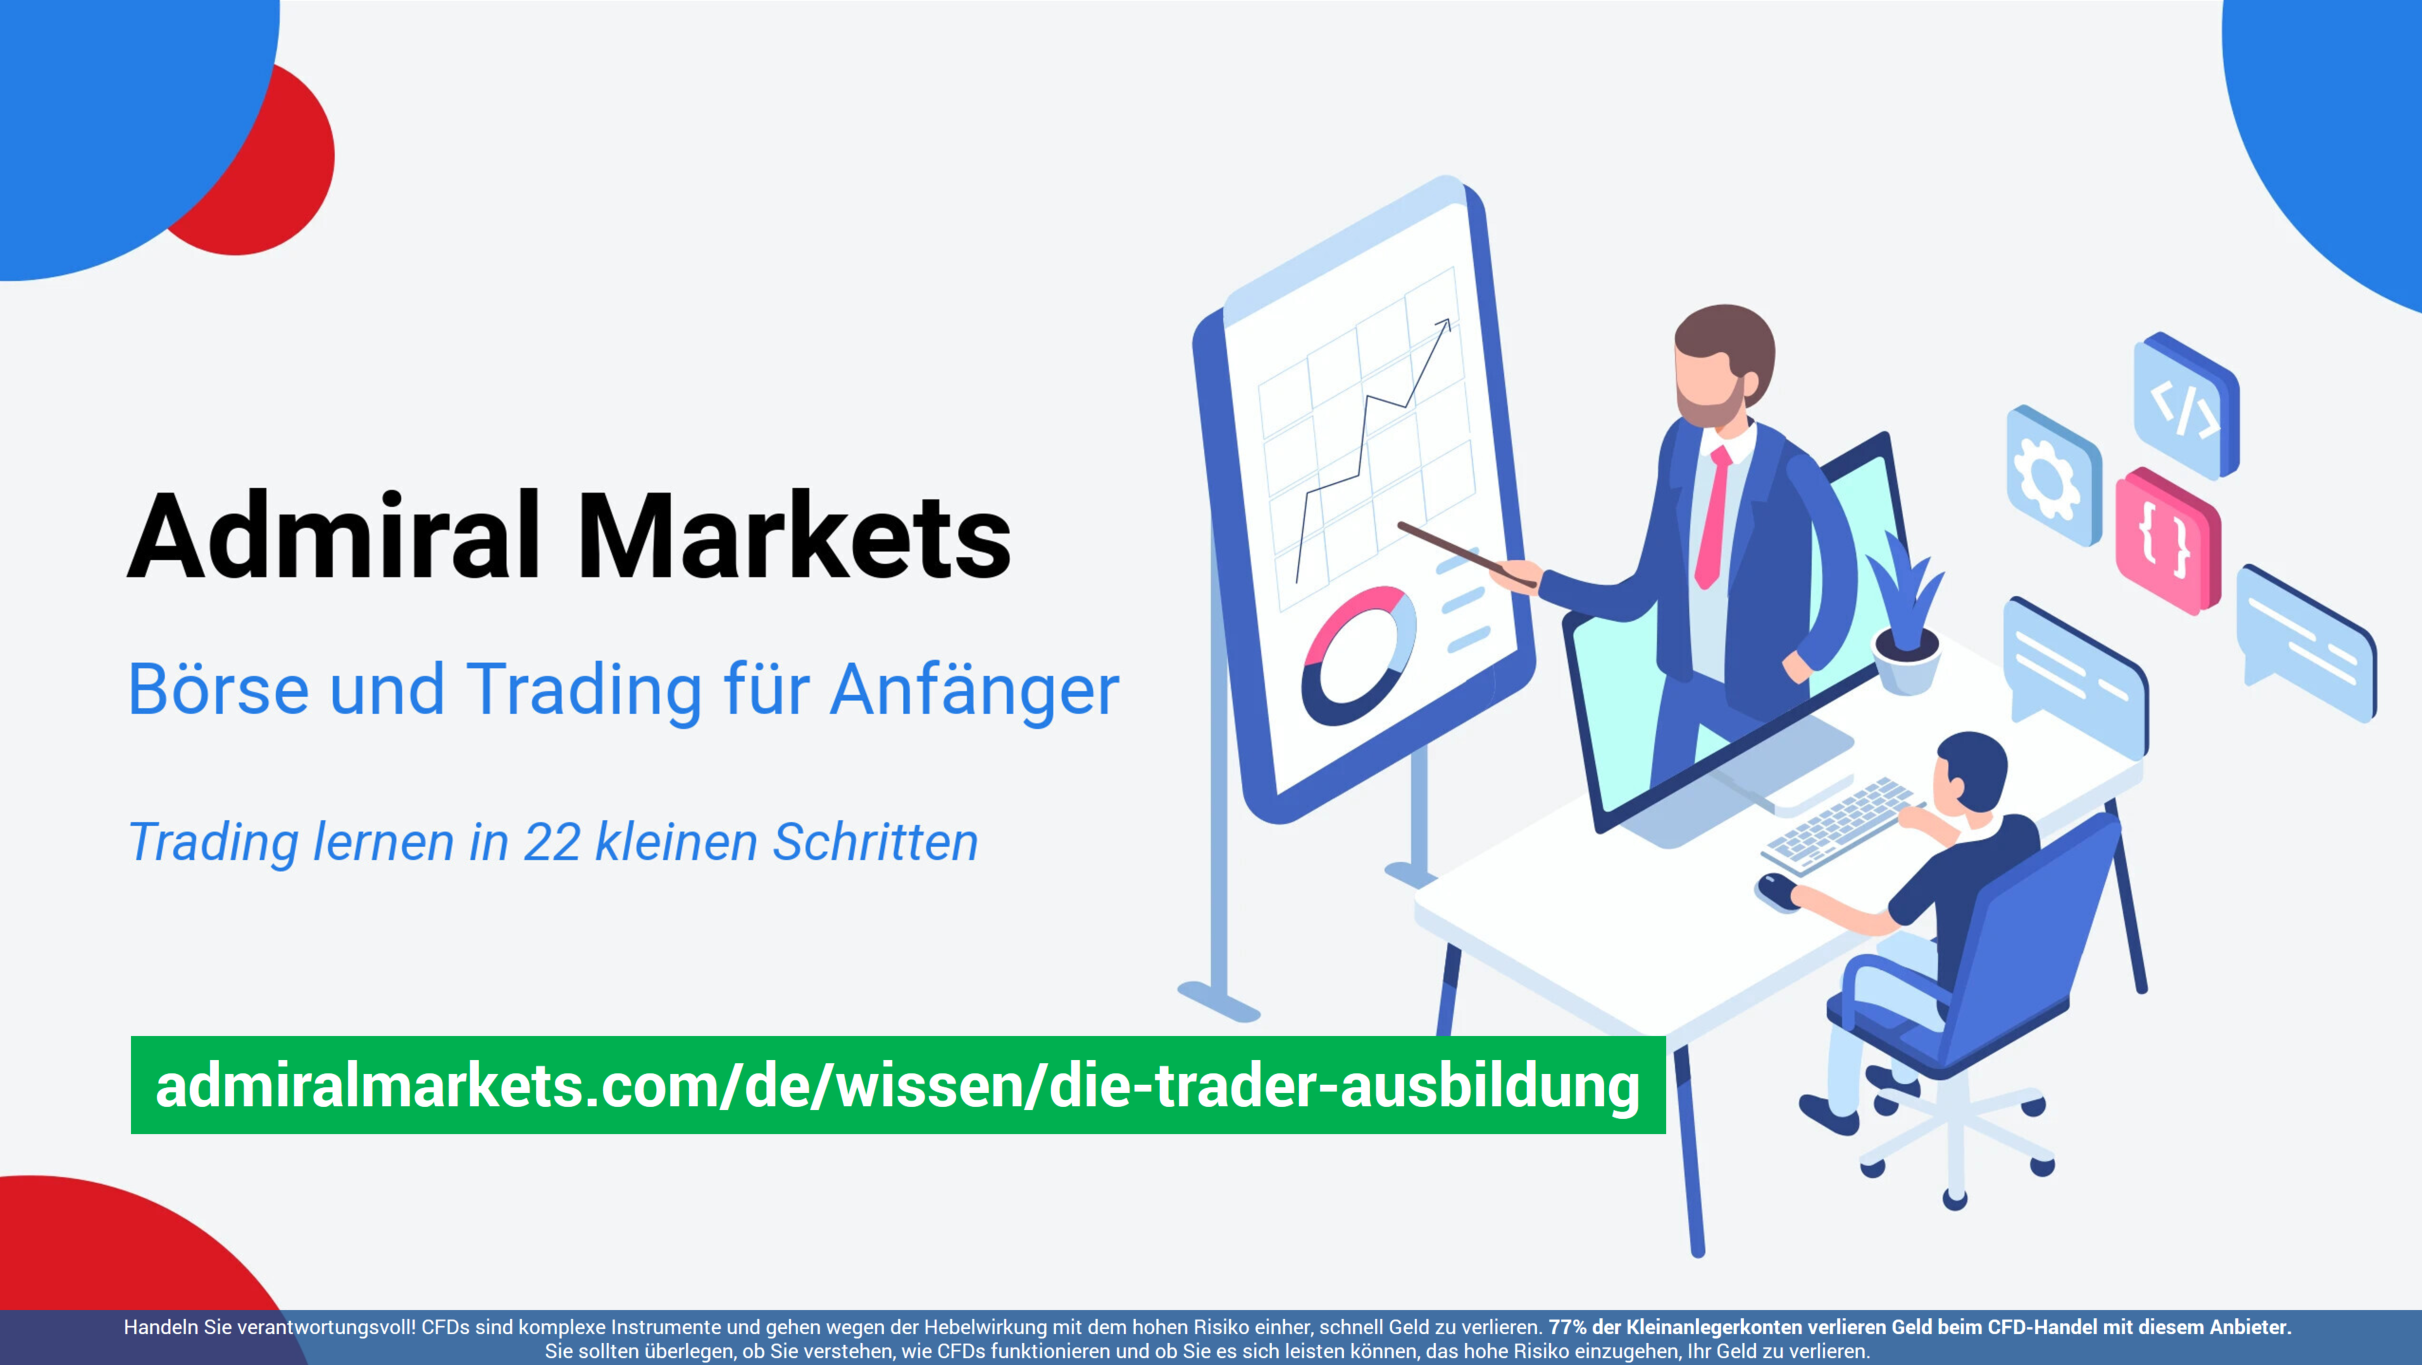 DAX-Analyse-Setups-Scalping-Tradingideen-01-03-2021-Guten-Morgen-DAX-Jens-Chrzanowski-GodmodeTrader.de-2